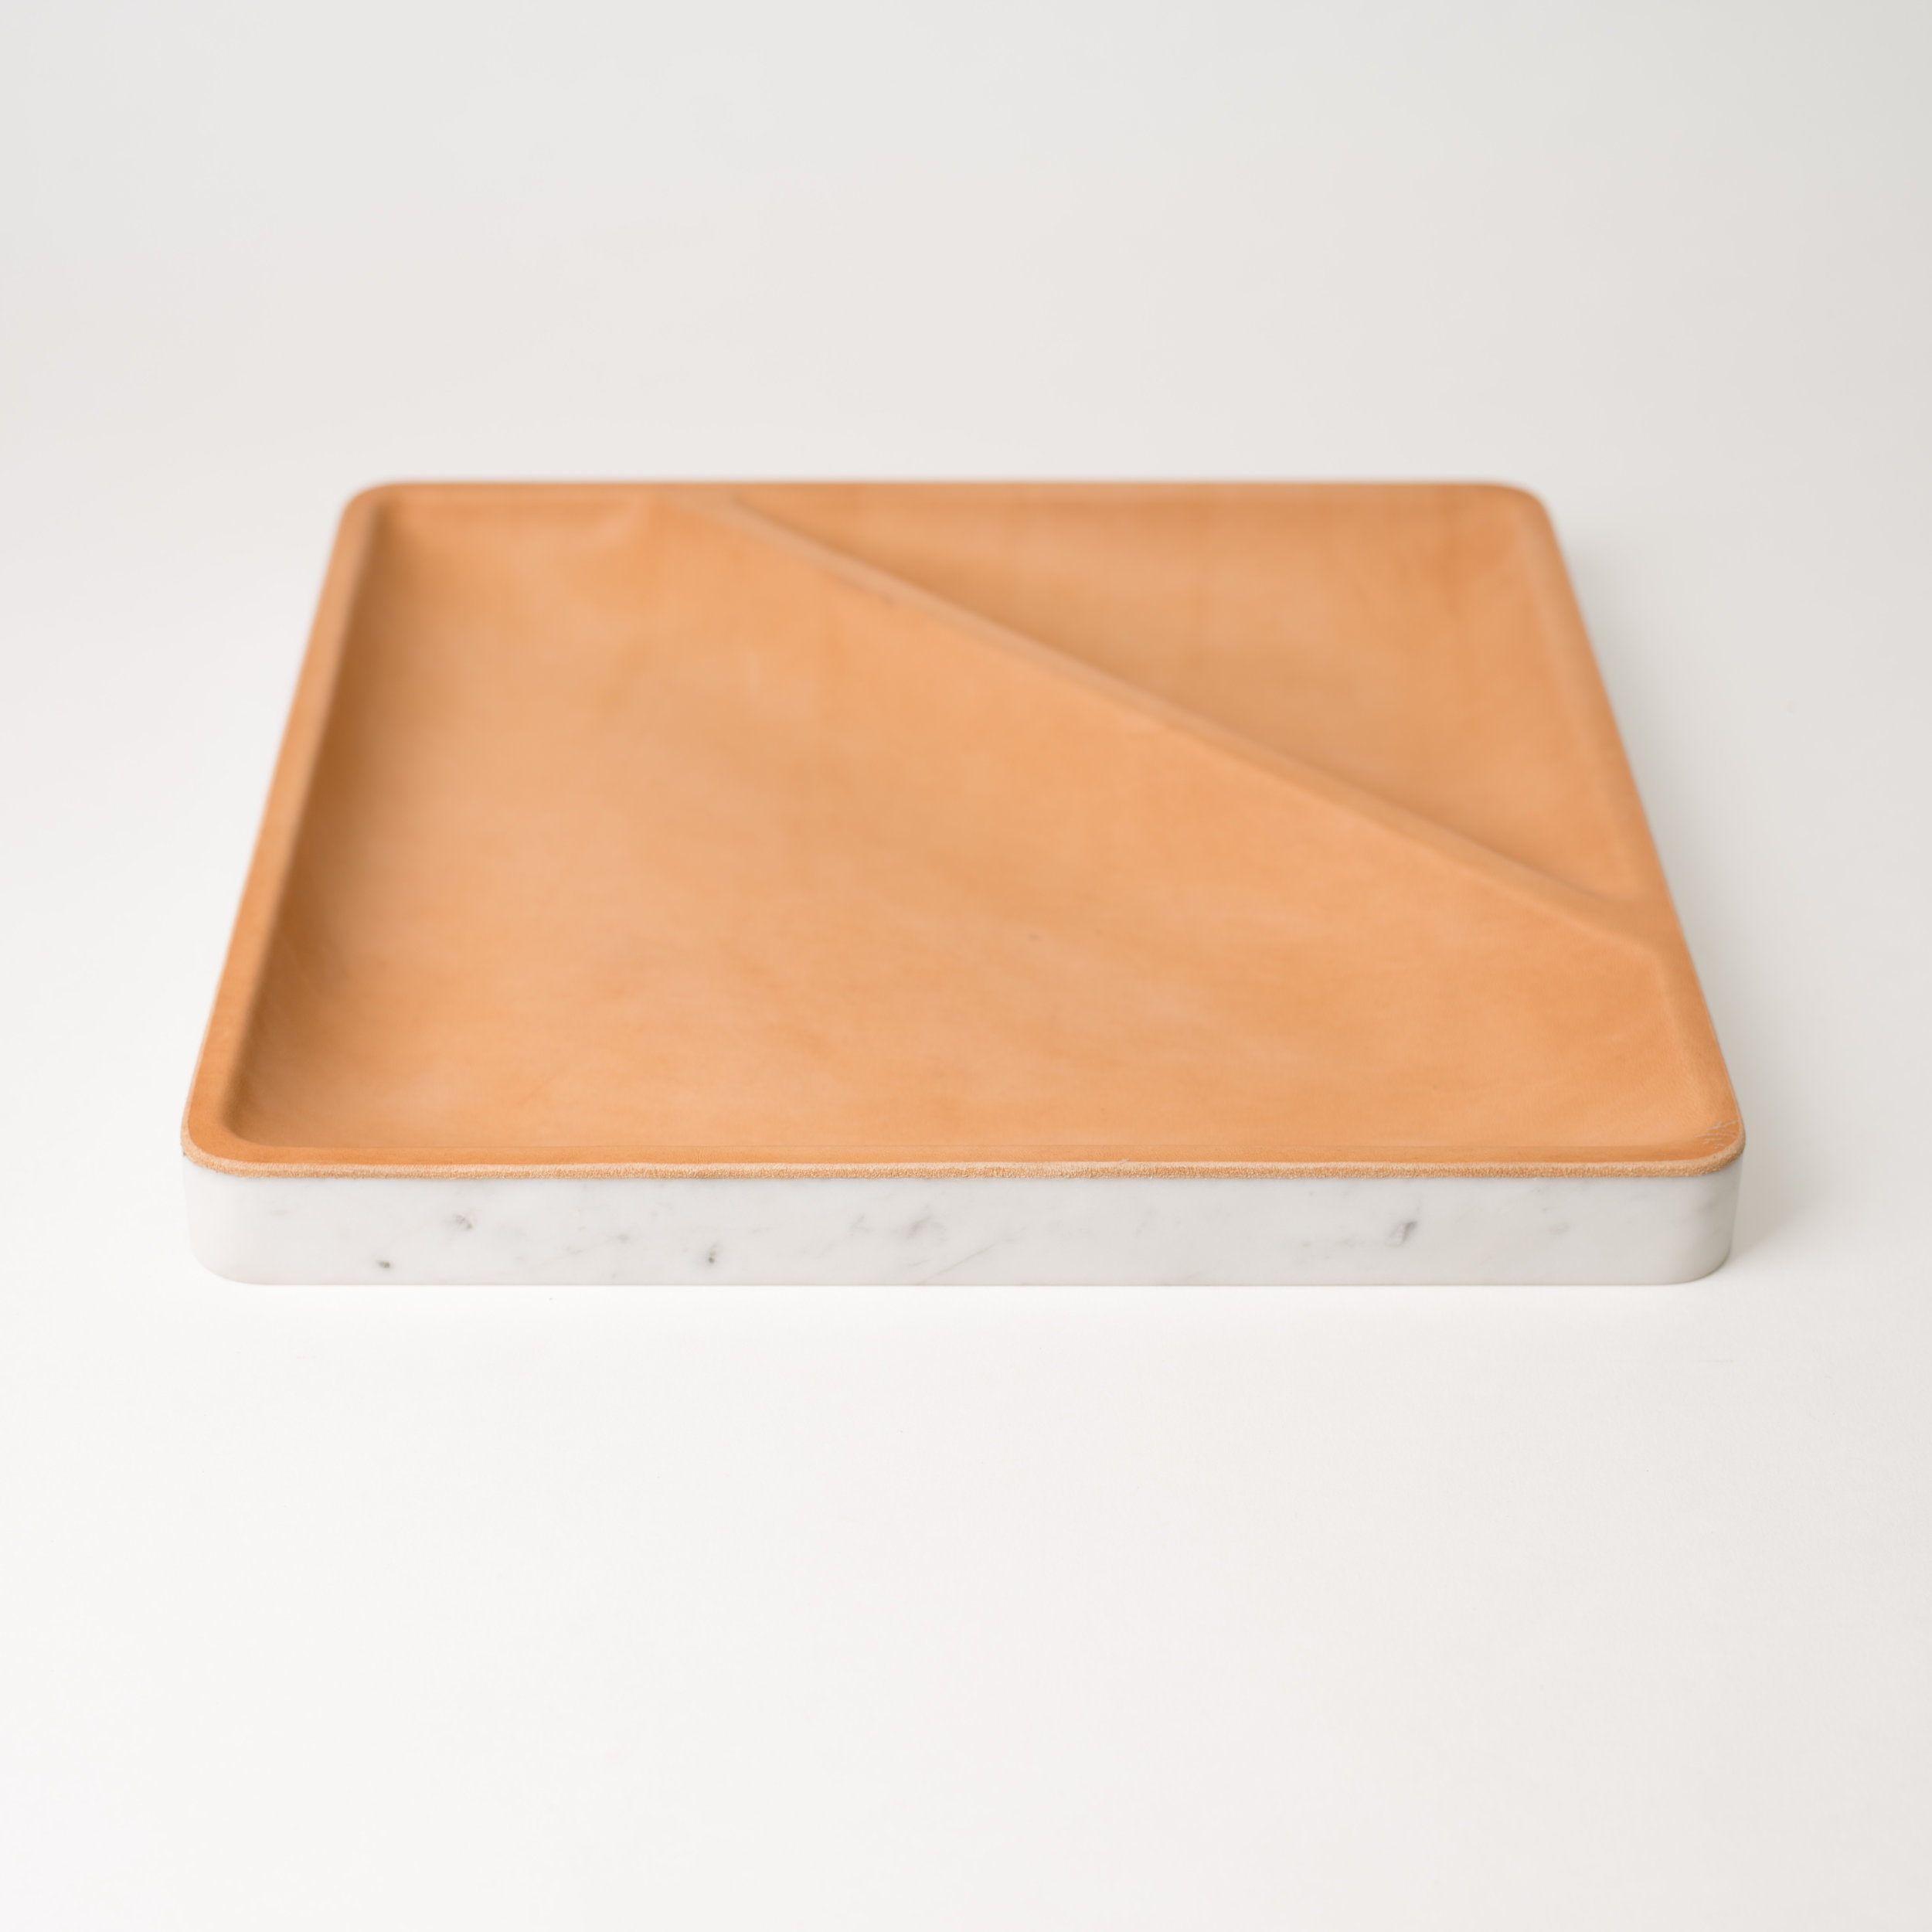 new trays oct 5th-1300.jpg